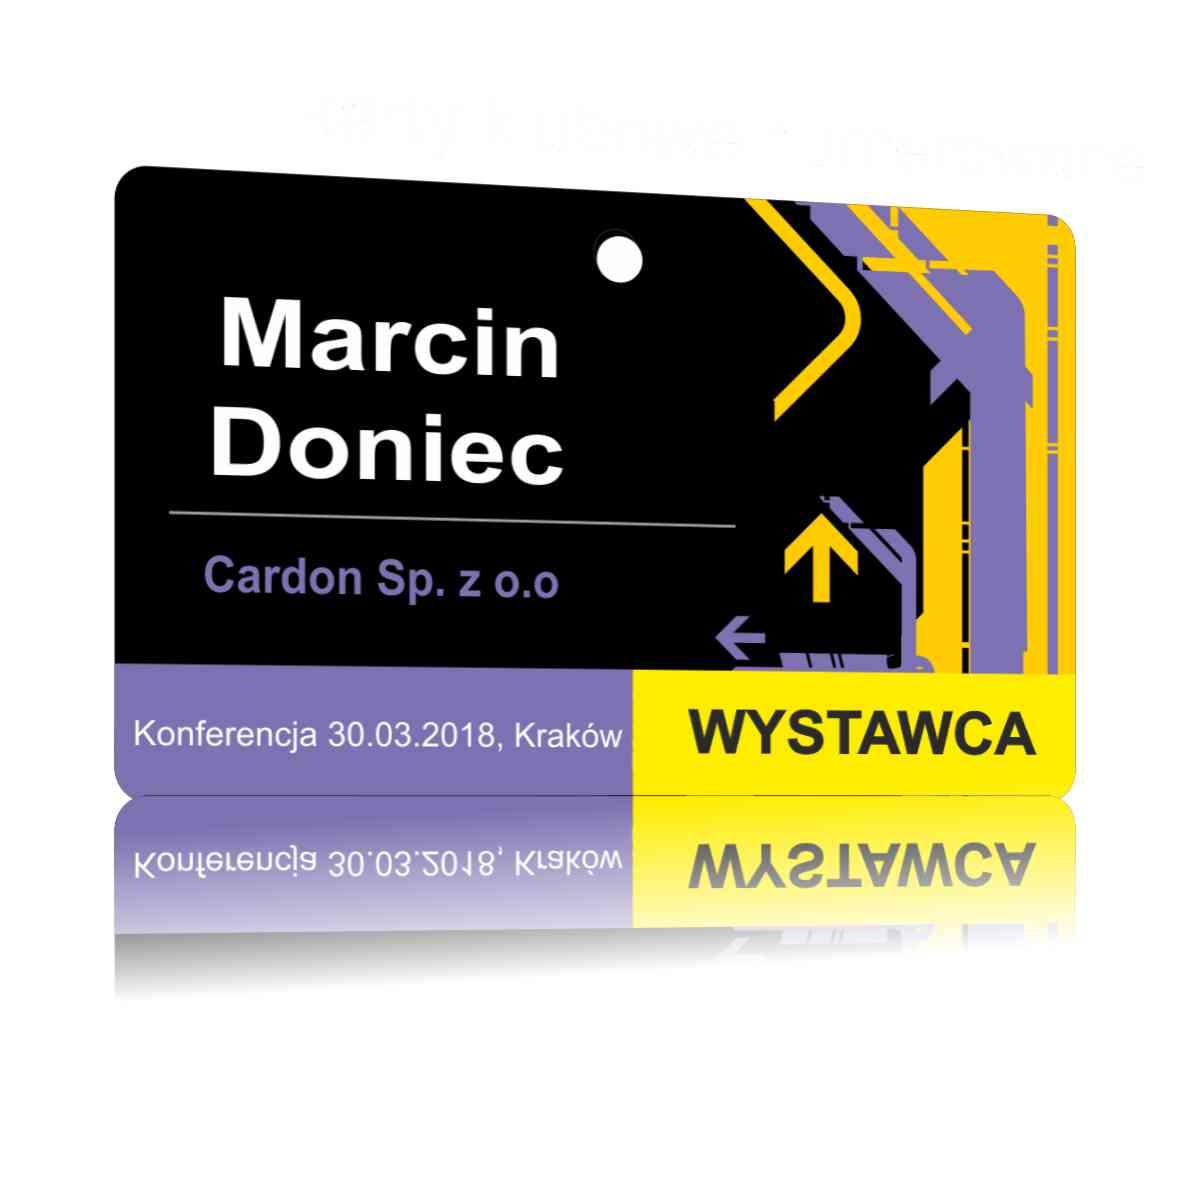 Karty plastikowe sklep - Identyfikatory konferencyjne